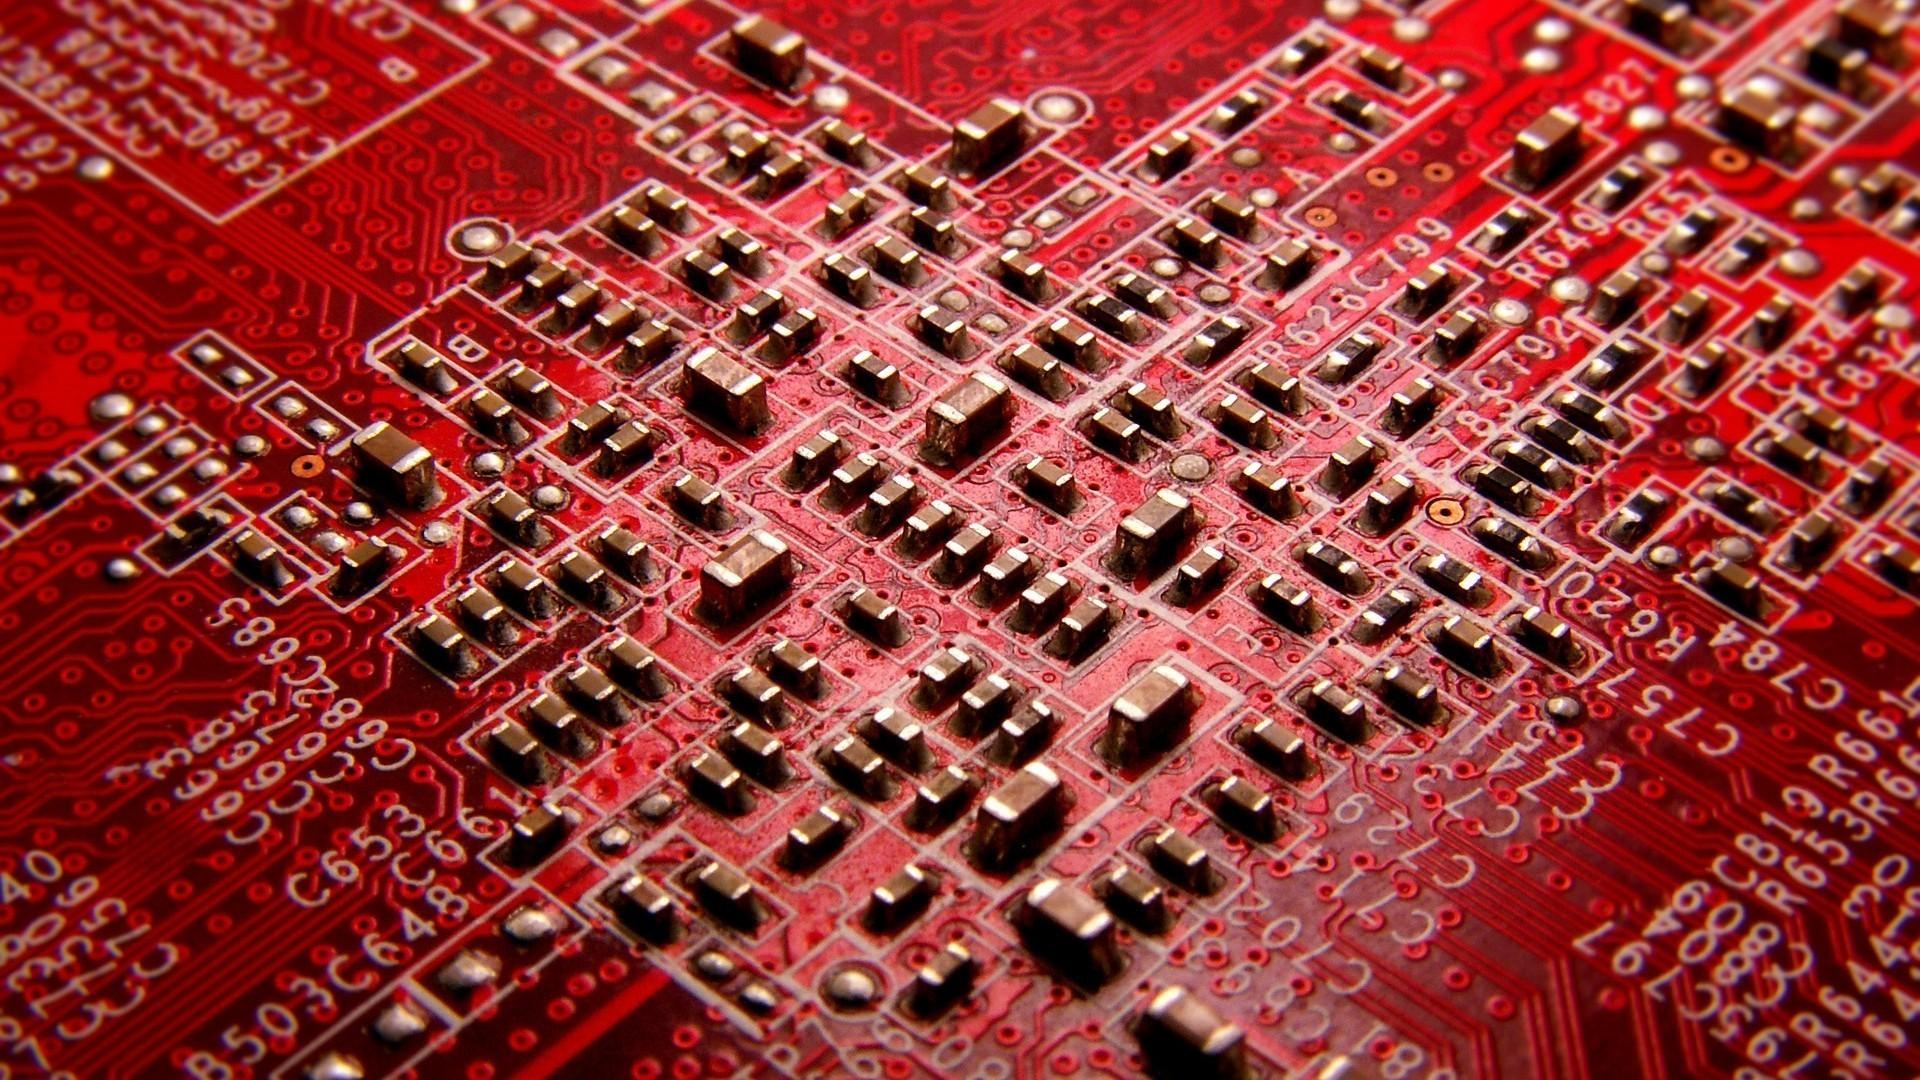 General hardware red circuit boards PCB resistor